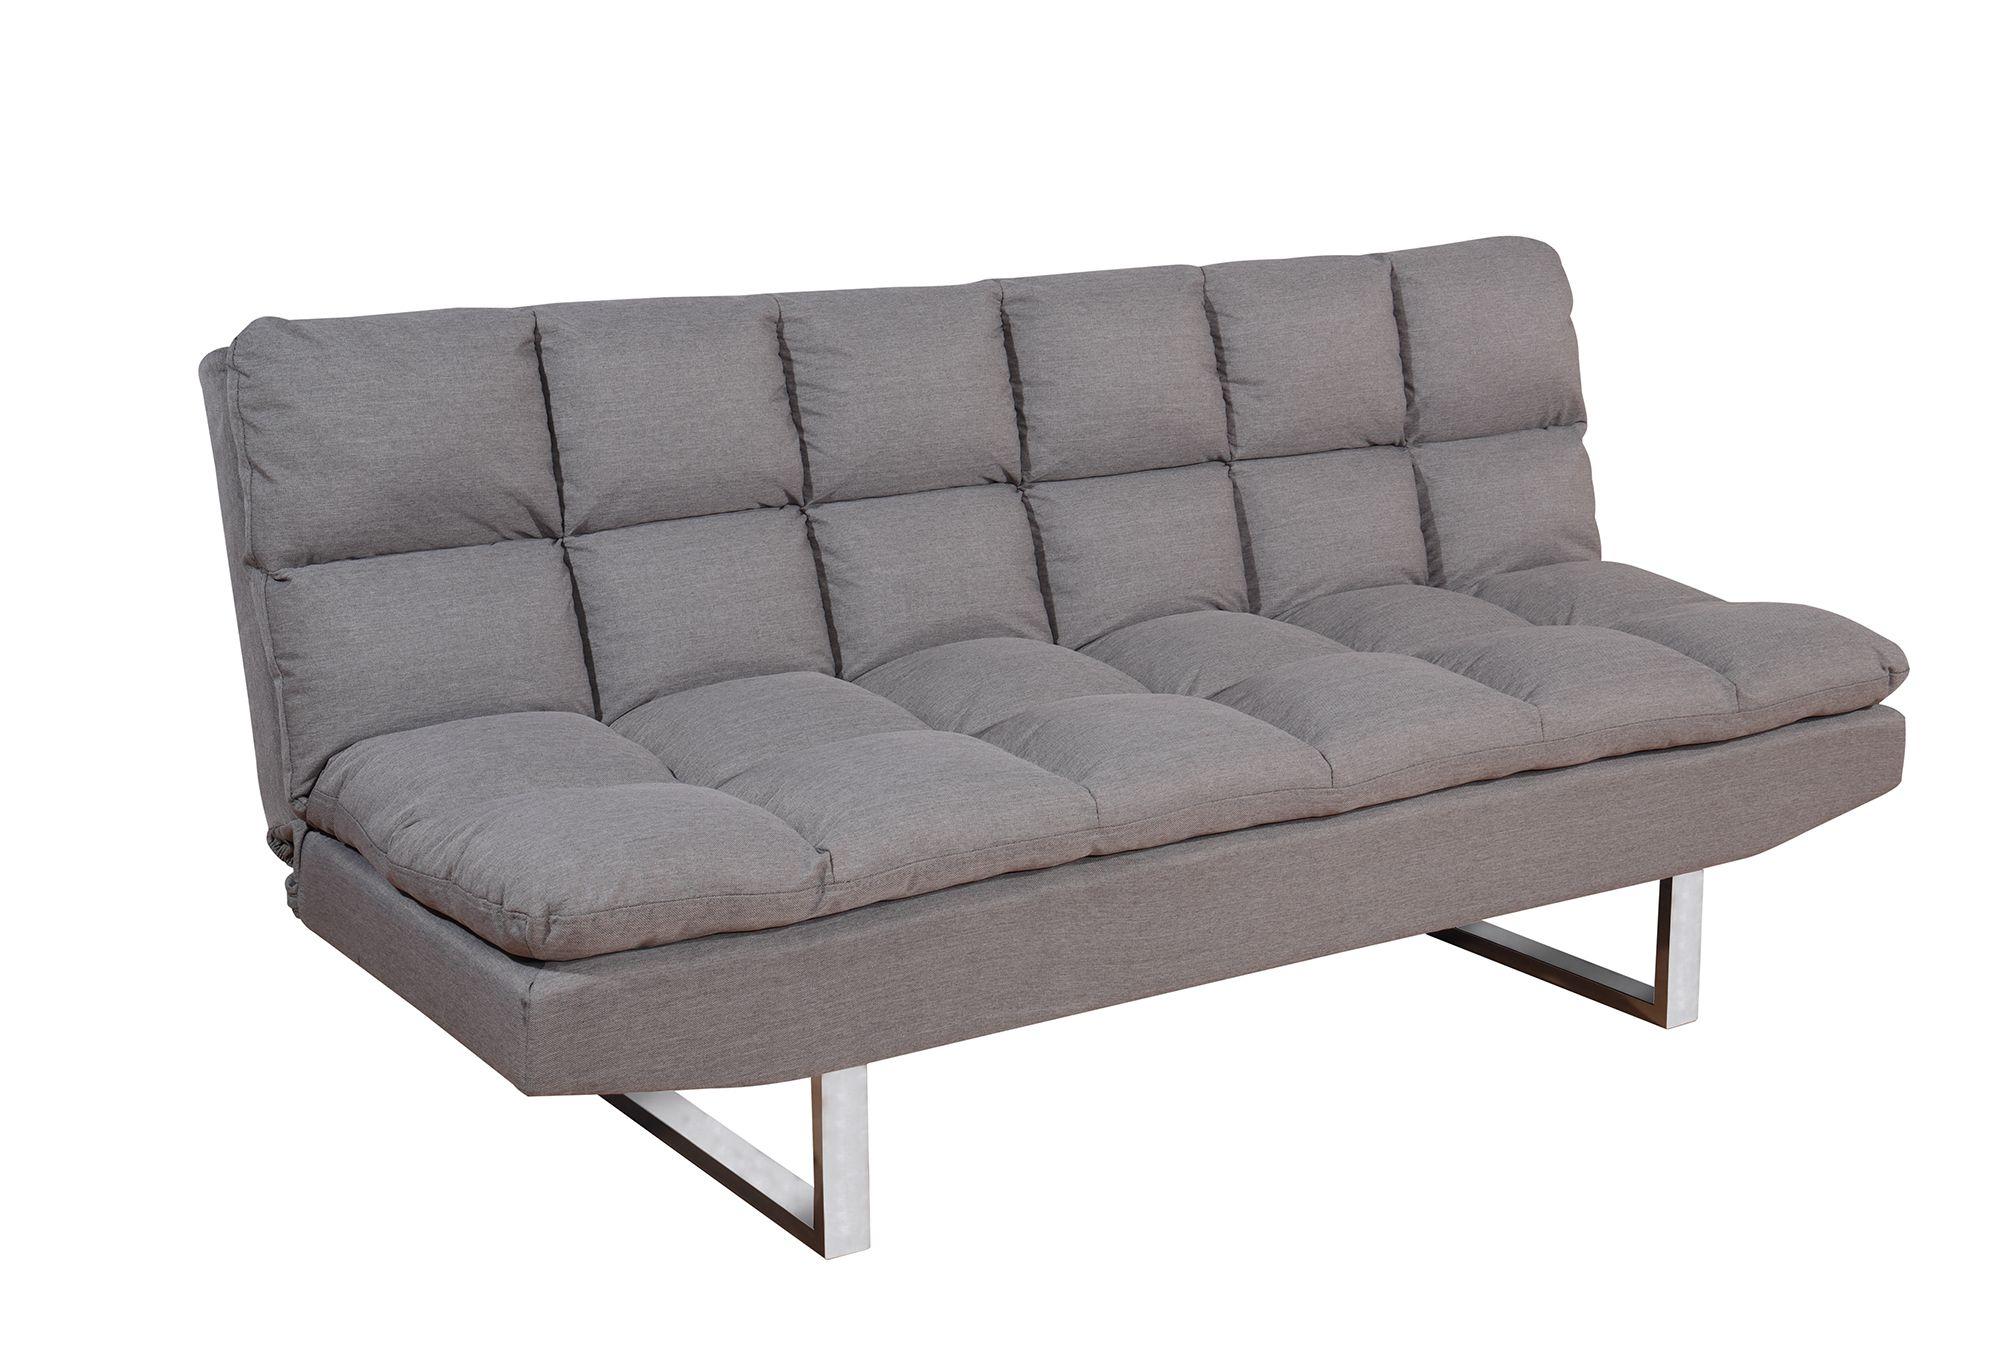 Kyoto Boston Sofa Bed